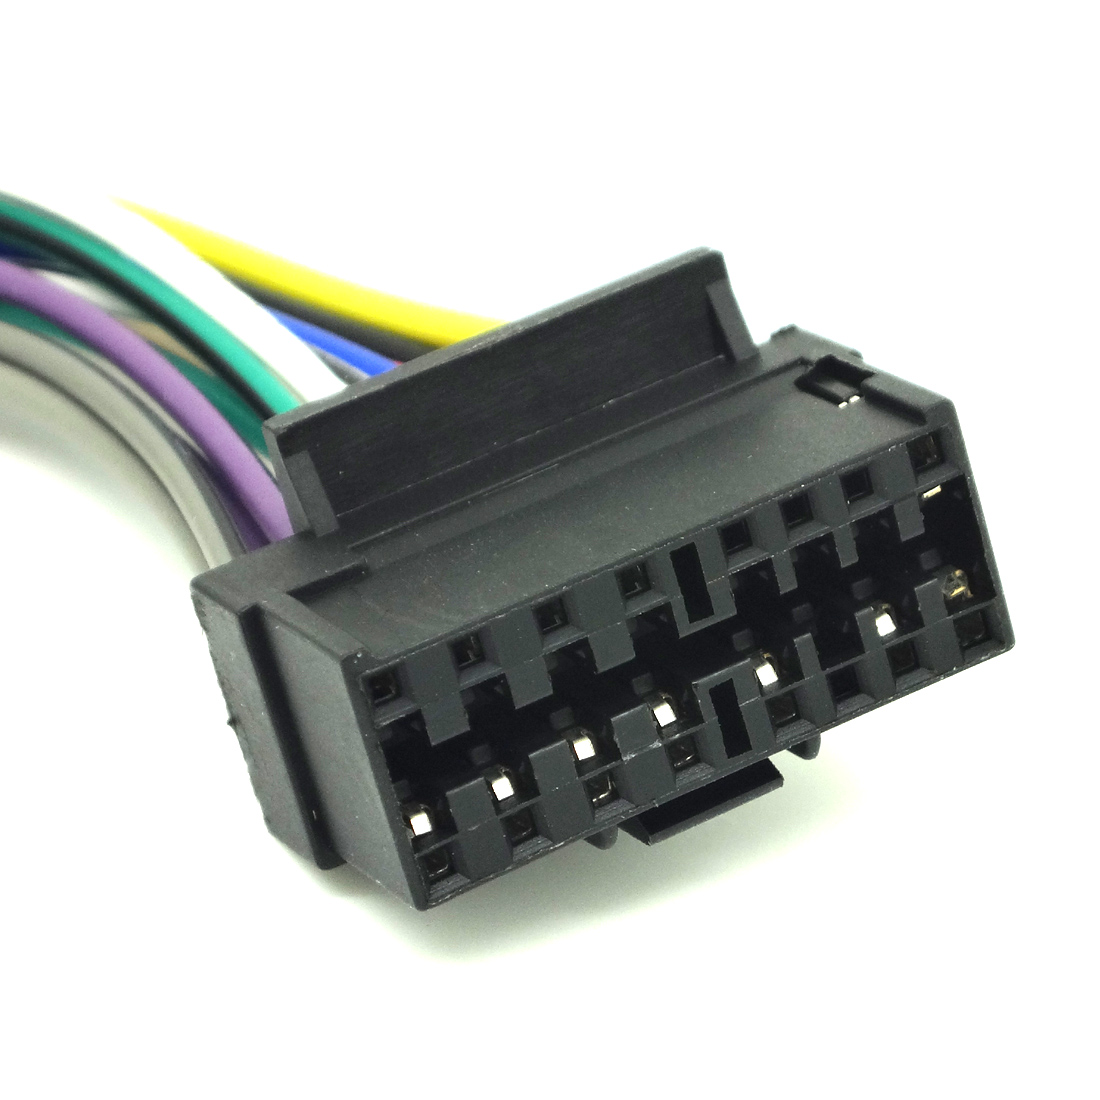 jvc kd g310 wiring diagram wiring diagram 610 radio wire harness for jvc kd [ 1100 x 1100 Pixel ]